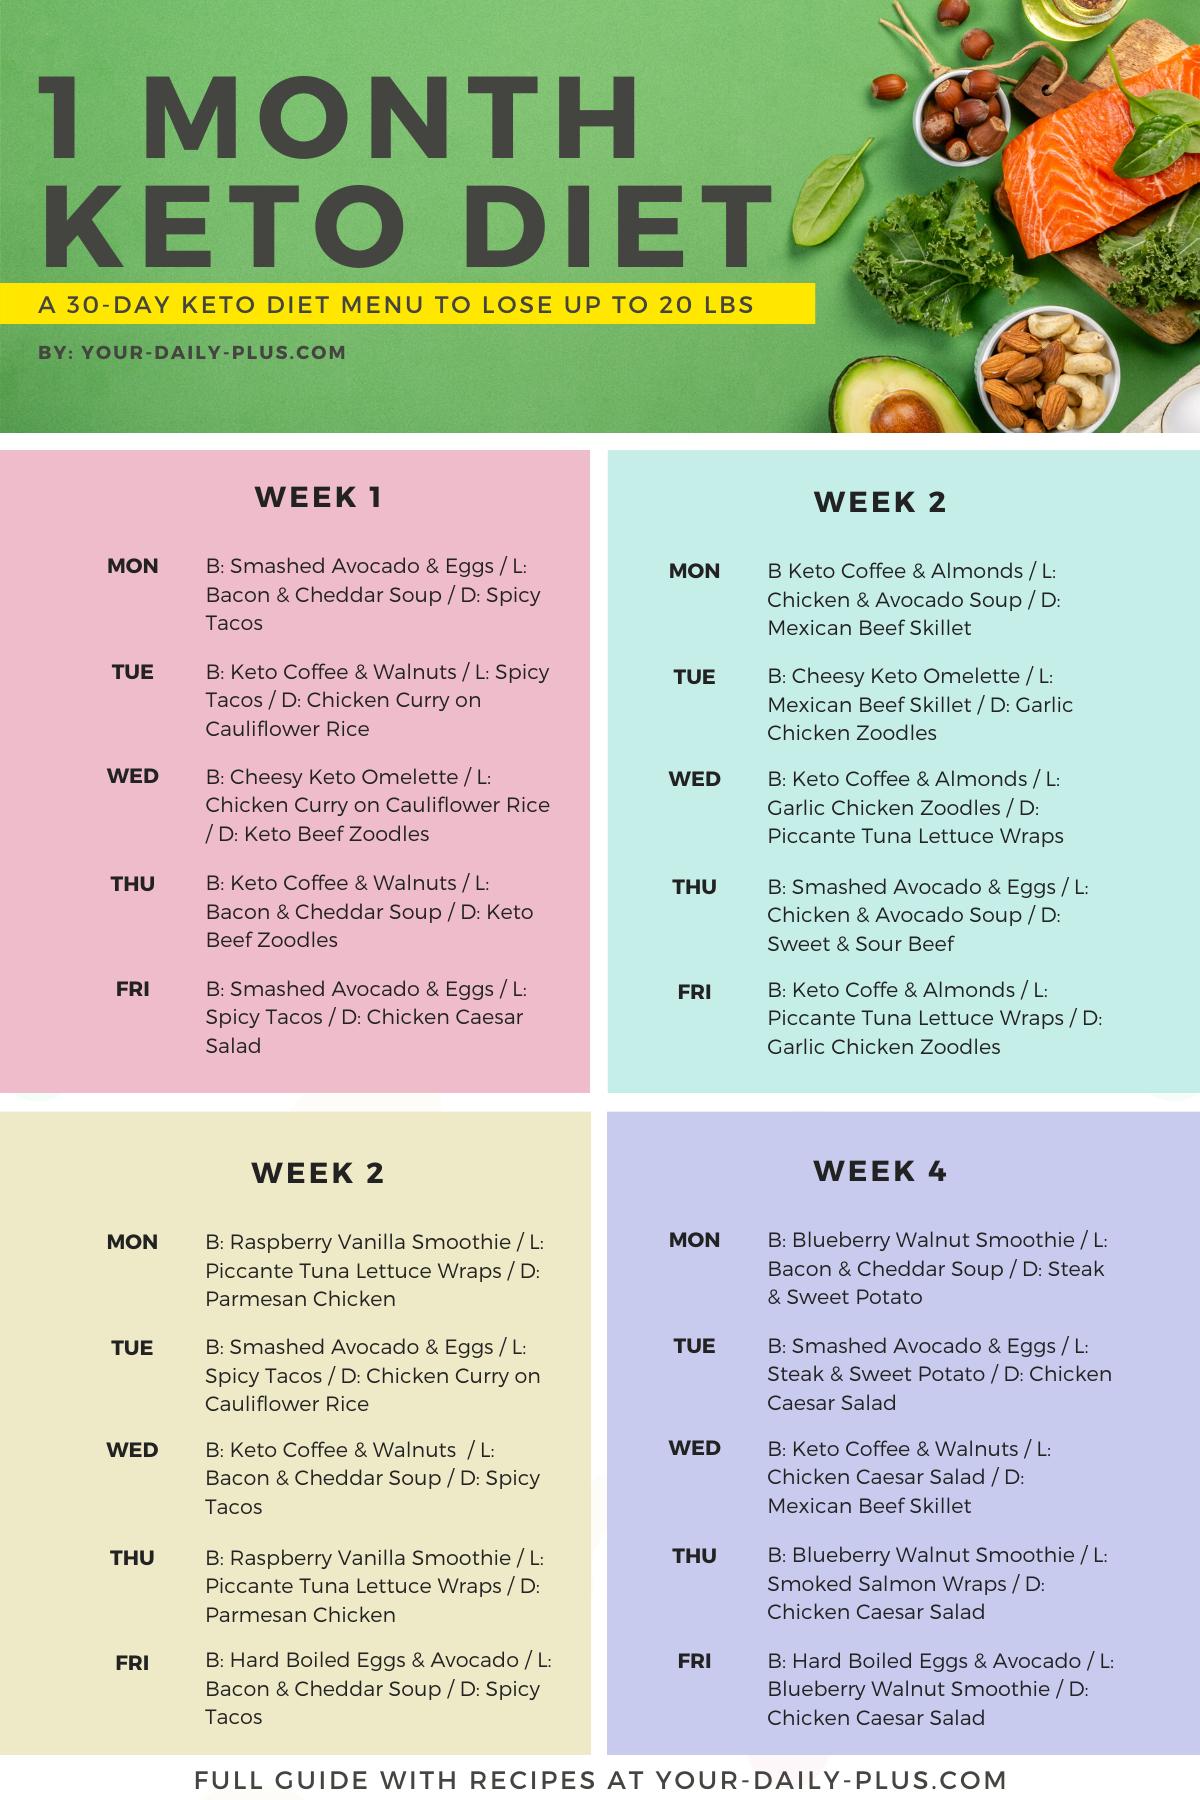 Keto Diet Menu 30 Day Keto Meal Plan For Beginners Keto Diet Guide Ketogenic Diet Meal Plan Keto Diet Menu